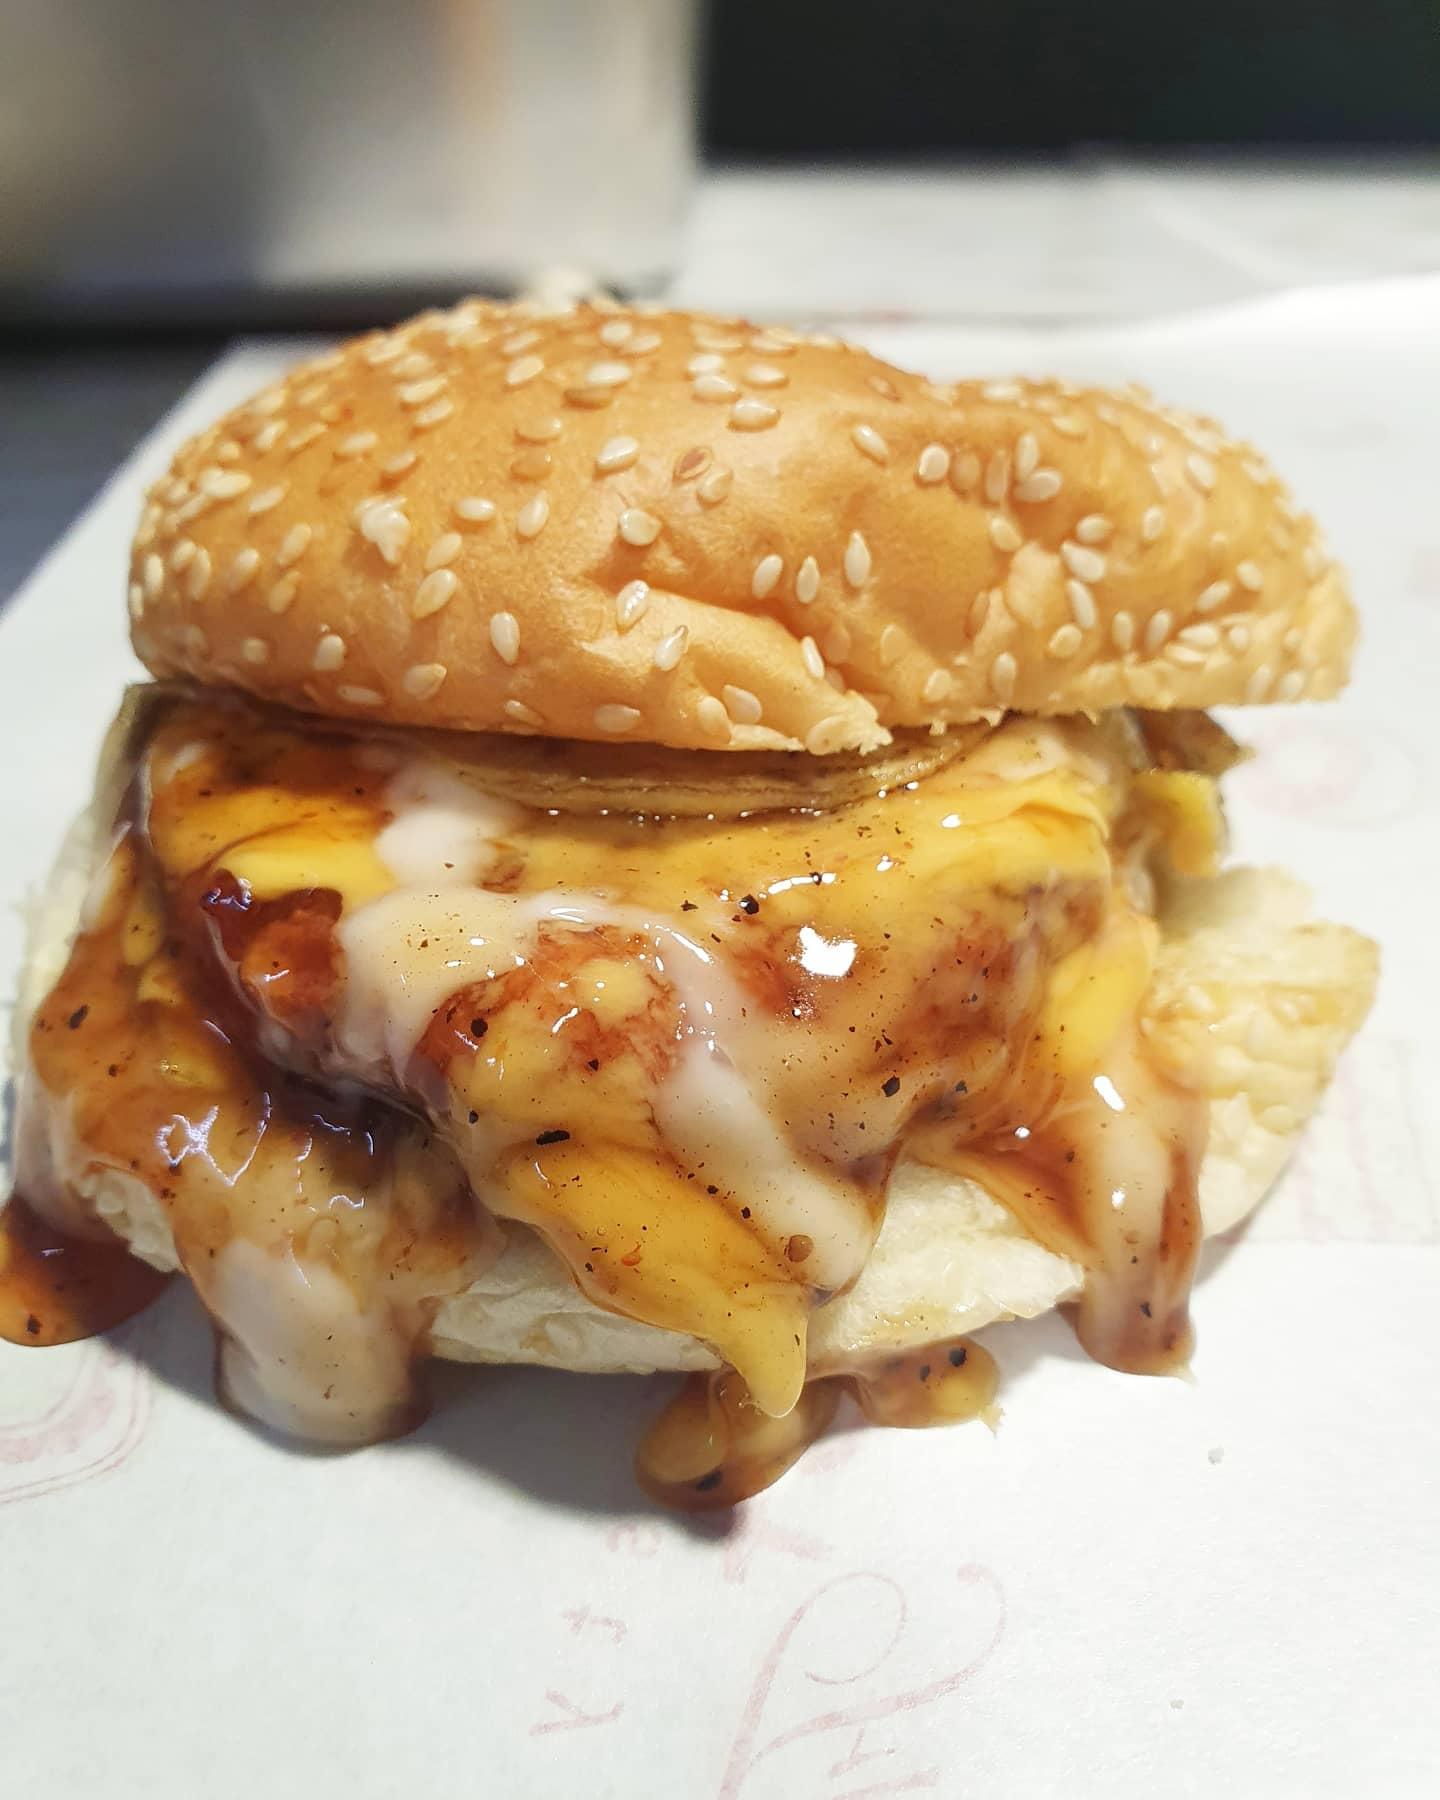 the original pisang keju ramly burger